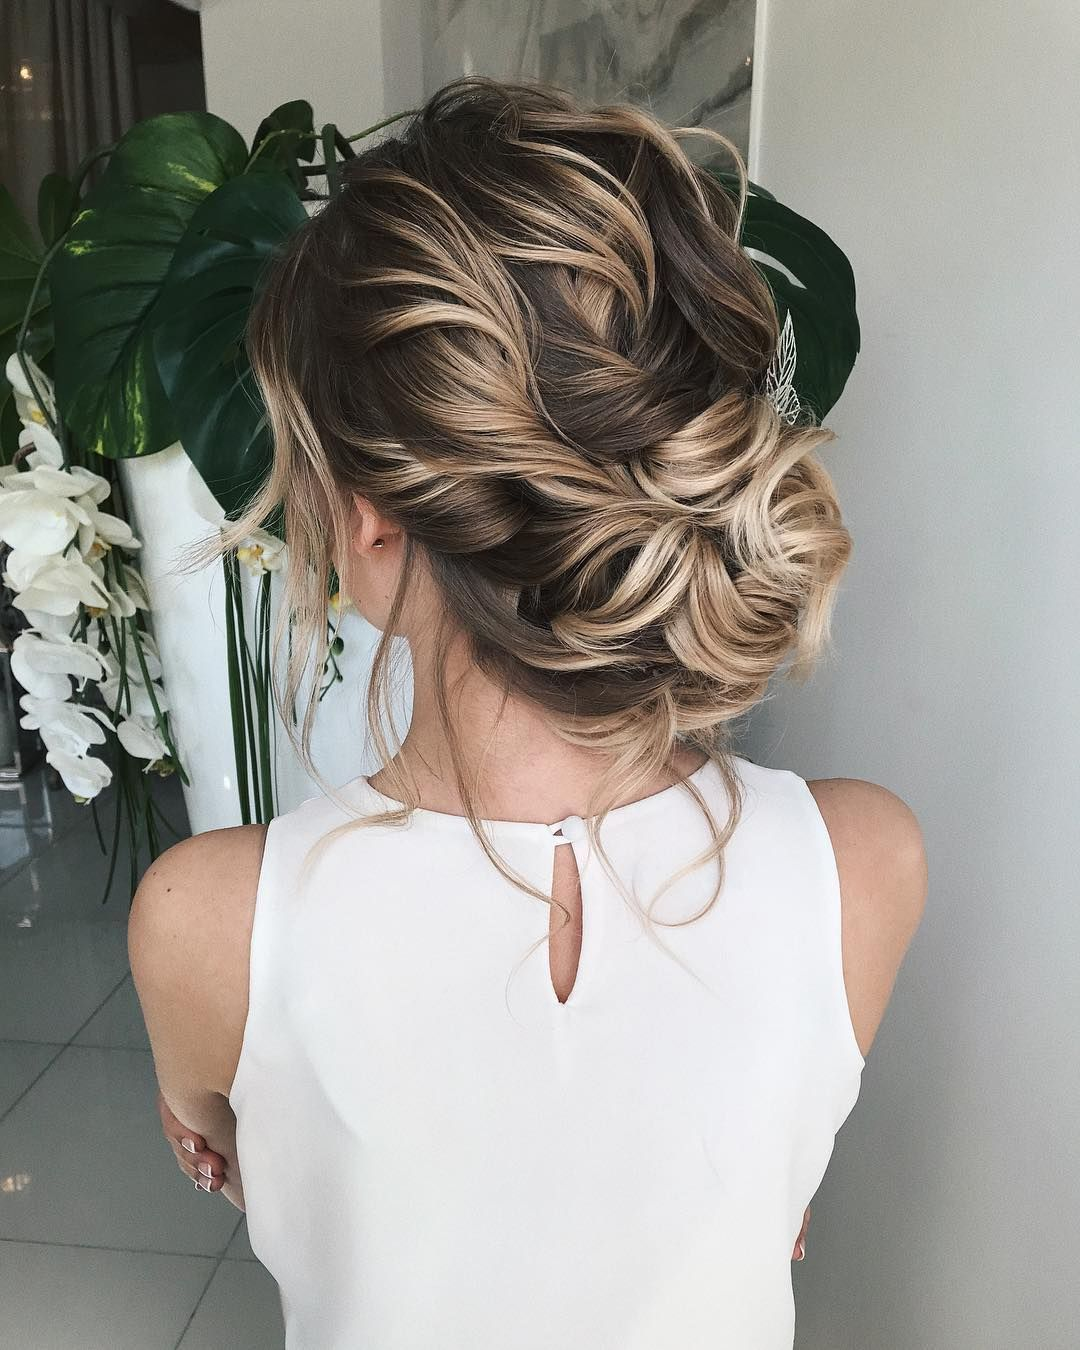 Twisted Wedding Updos For Medium Length Hair Wedding Updos Updo